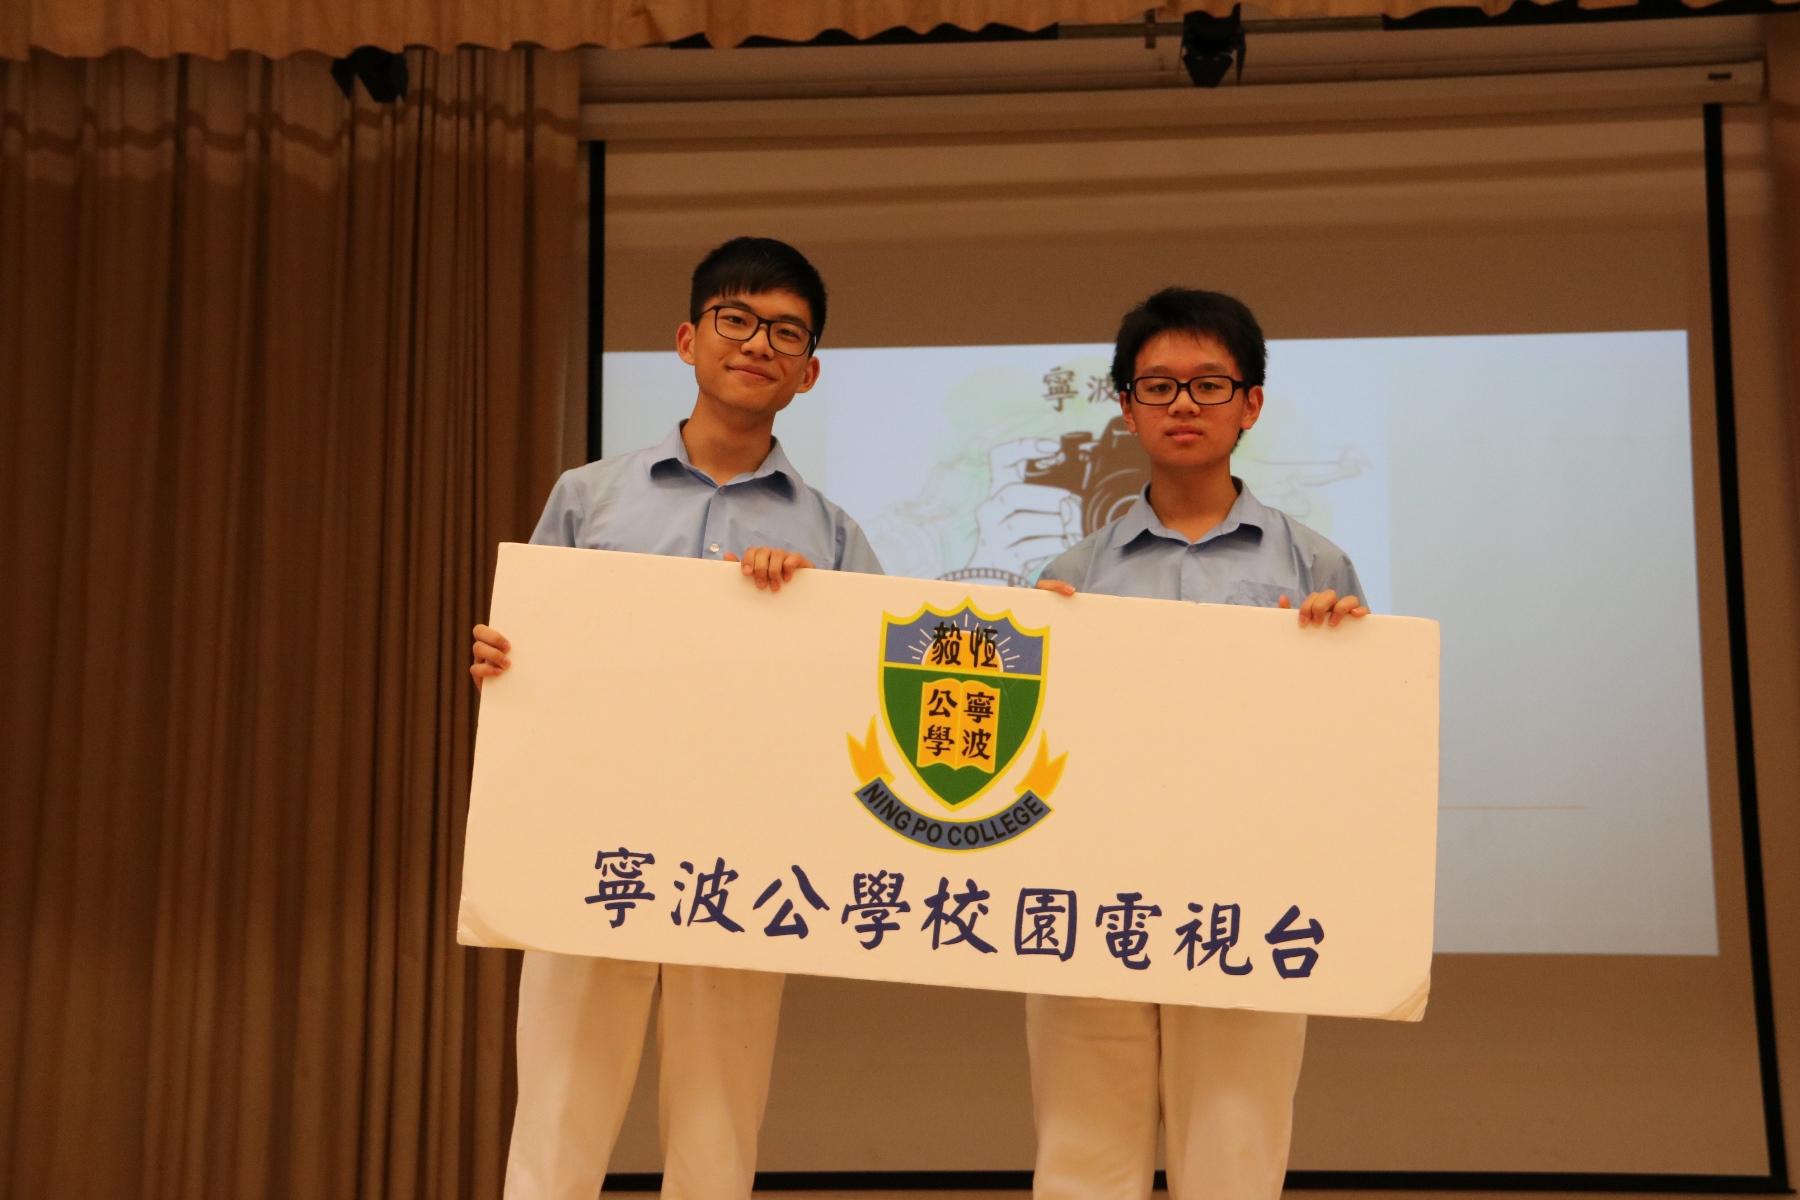 http://npc.edu.hk/sites/default/files/img_9142.jpg